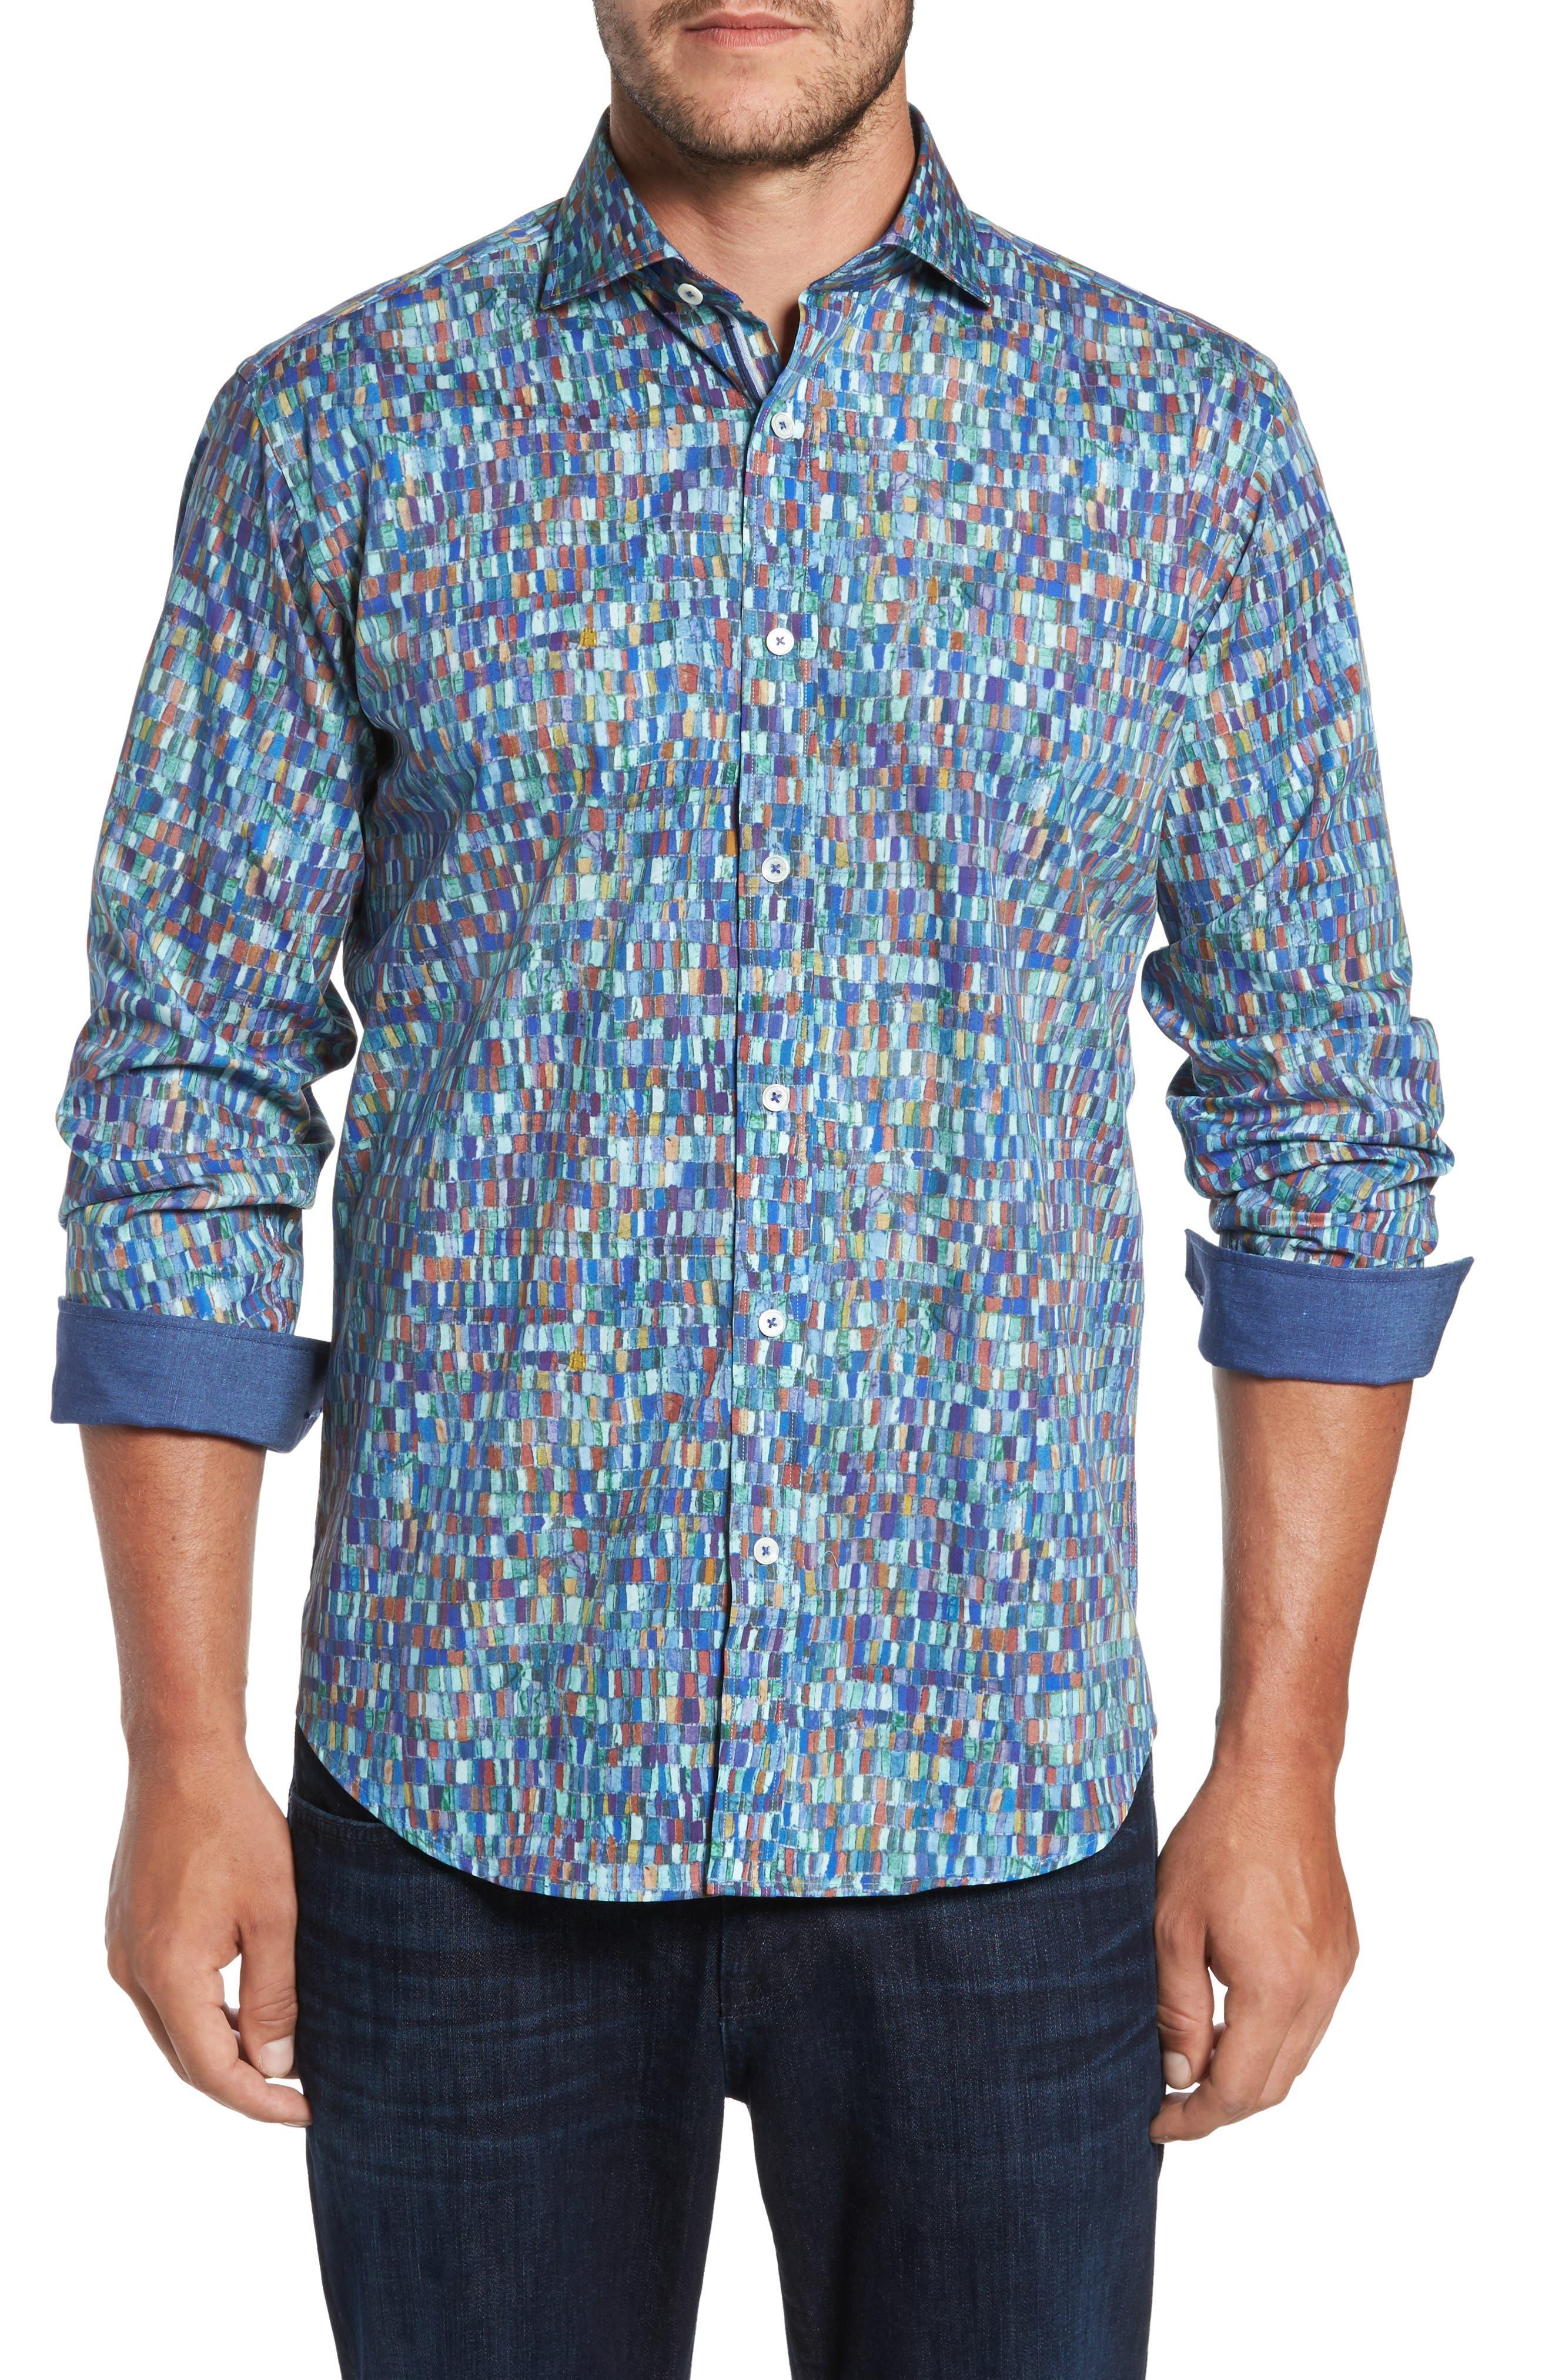 Alternate Image 1 Selected - Bugatchi Classic Fit Mosaic Print Sport Shirt